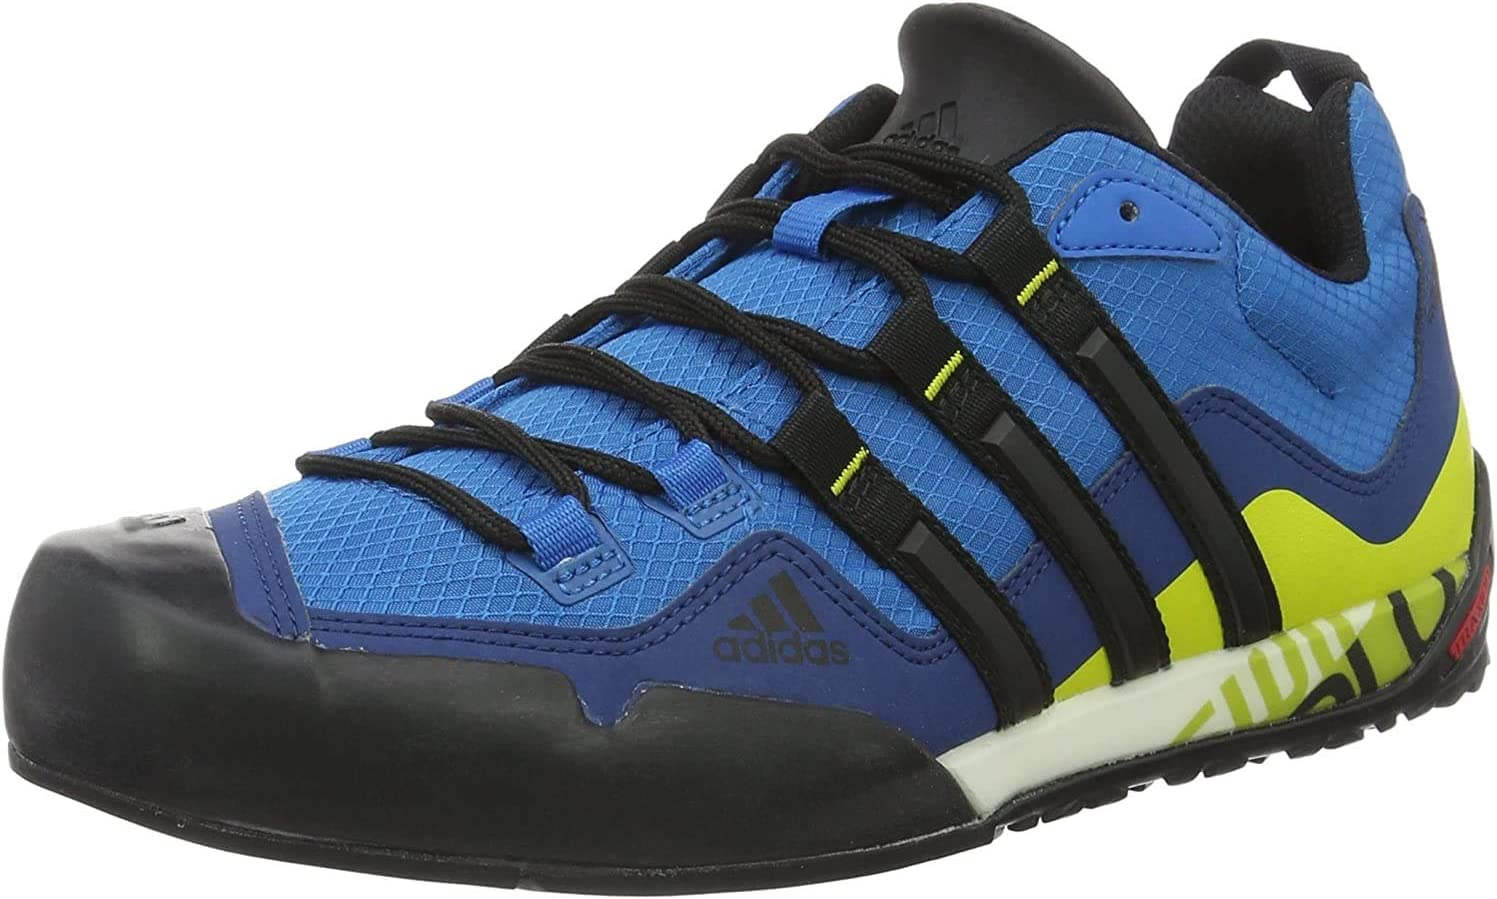 adidas Men's Multisport Outdoor Shoes